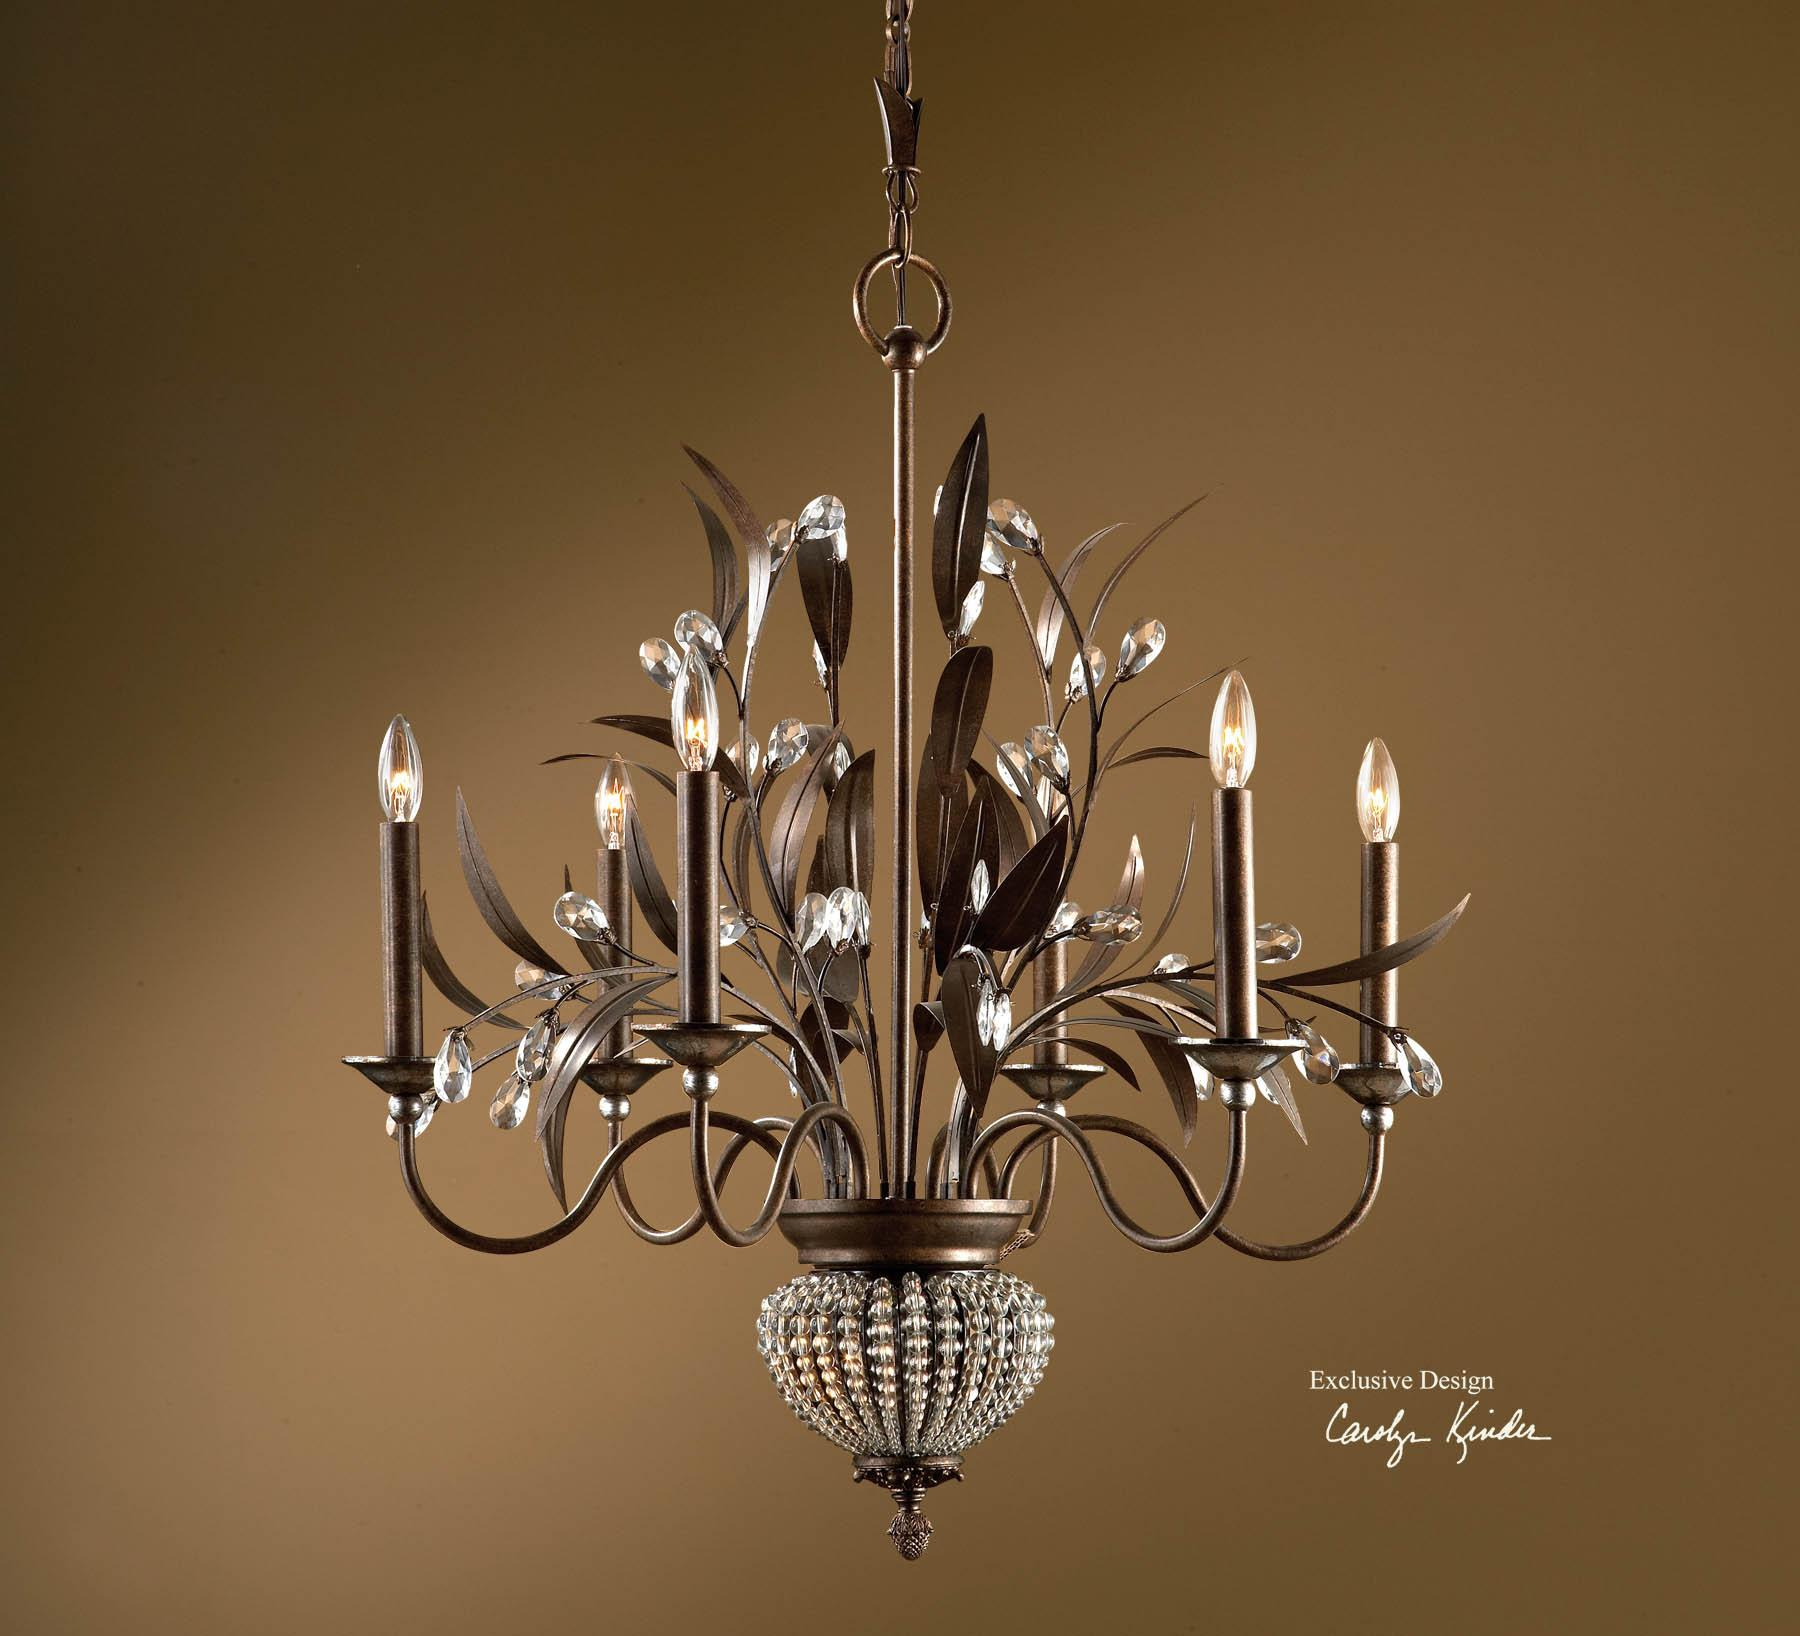 Uttermost Lighting Fixtures Cristal De Lisbon 6+2 Light Chandelier - Item Number: 21017